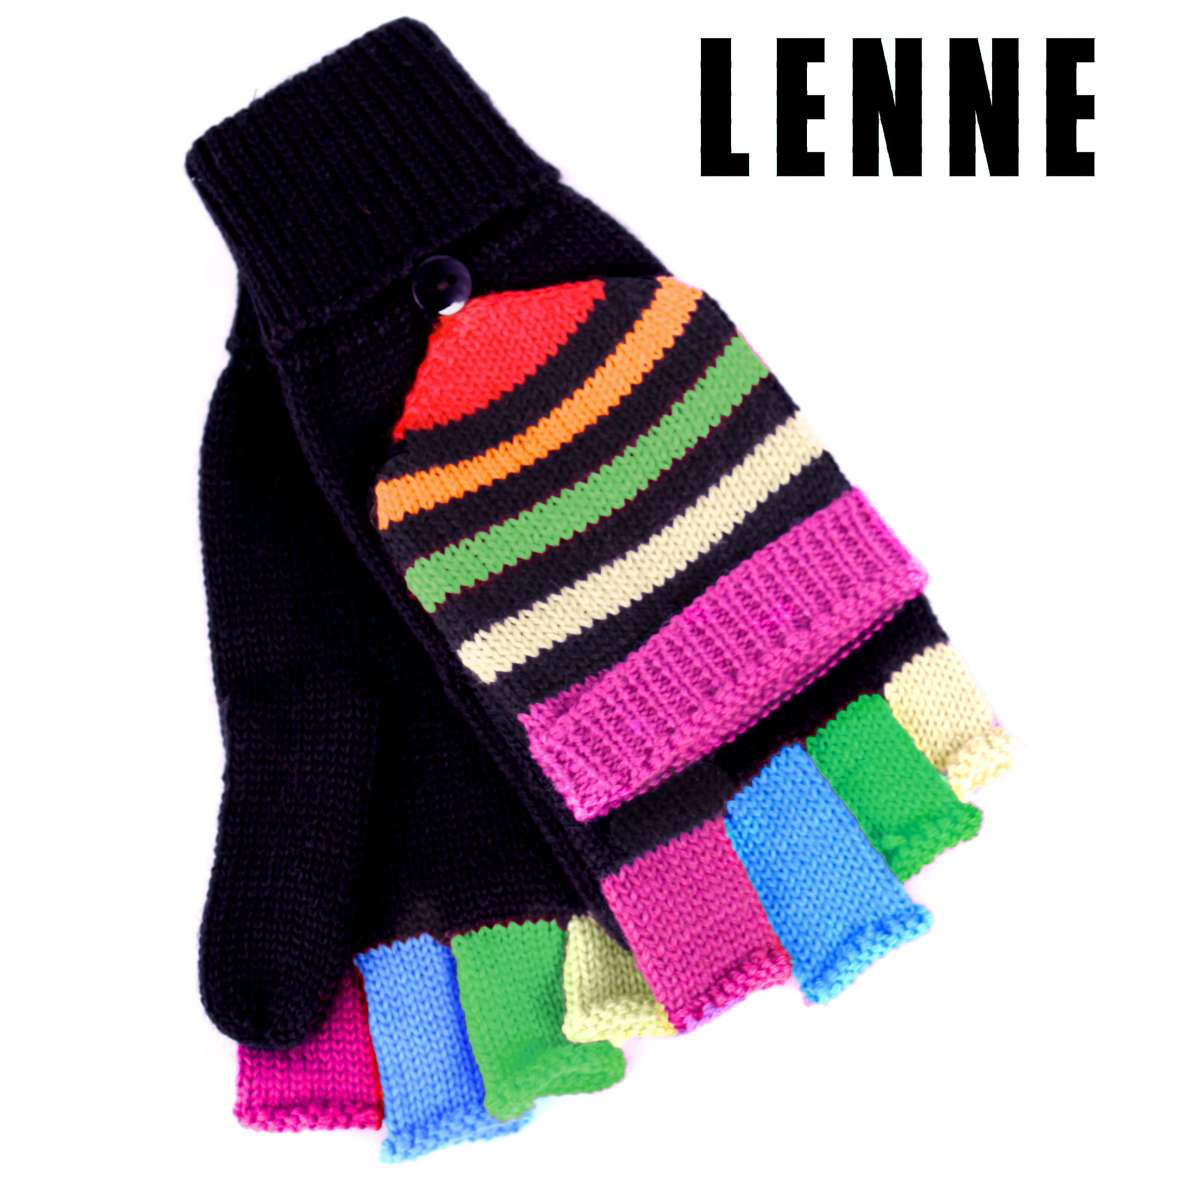 LENNE '14 - cimdi art.13347 krāsa 6130